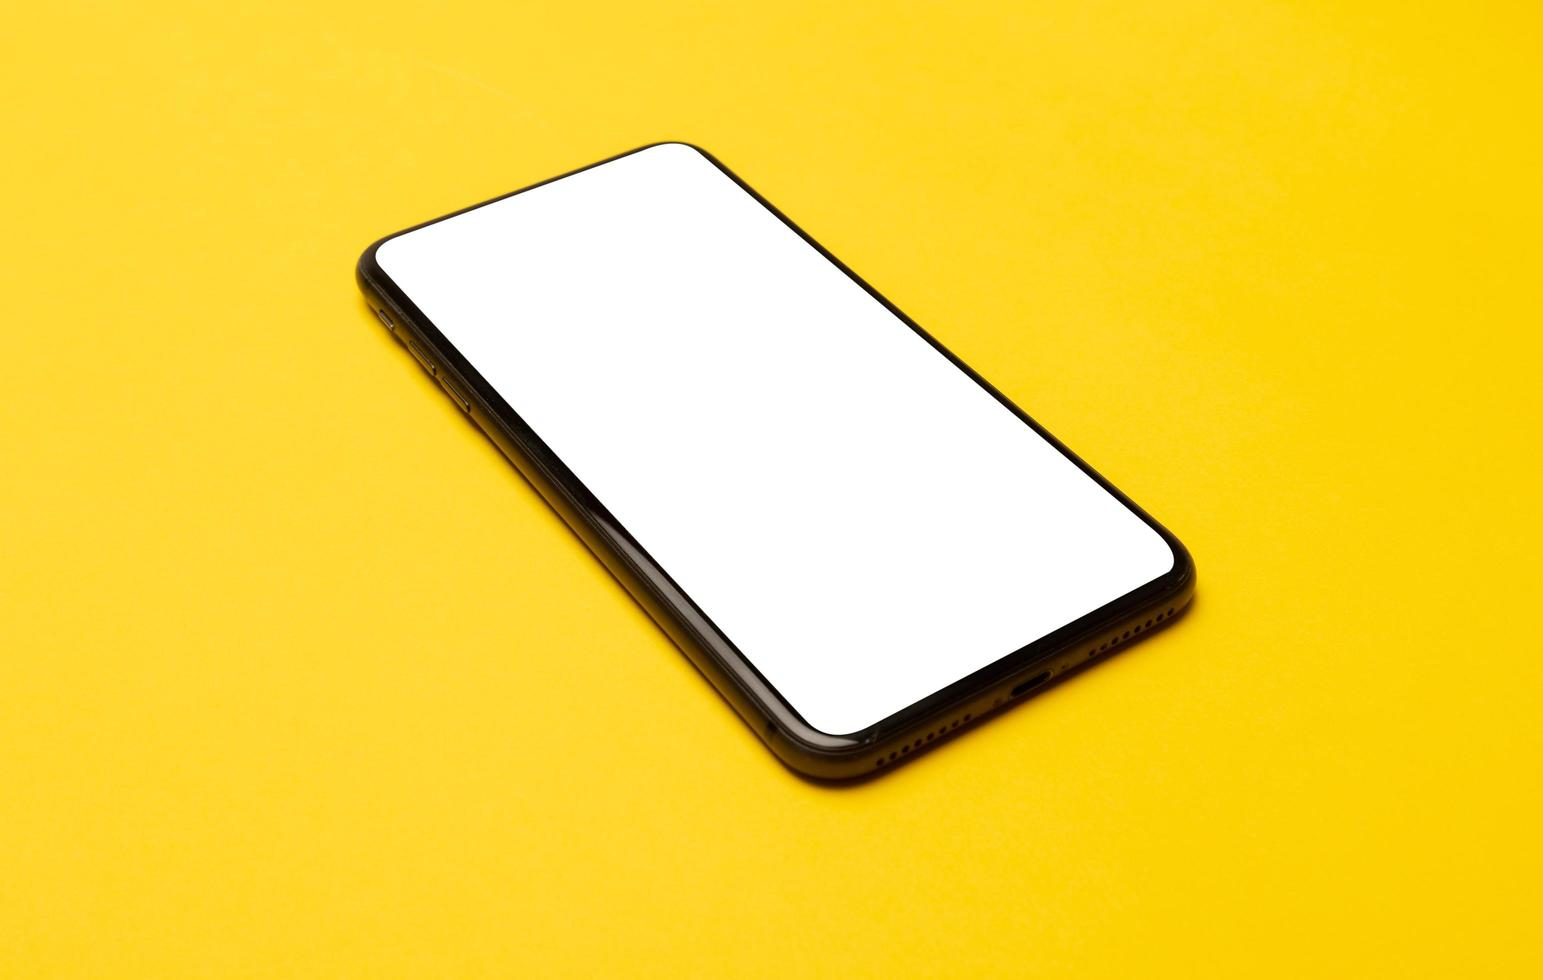 smart telefon på gul bakgrund foto